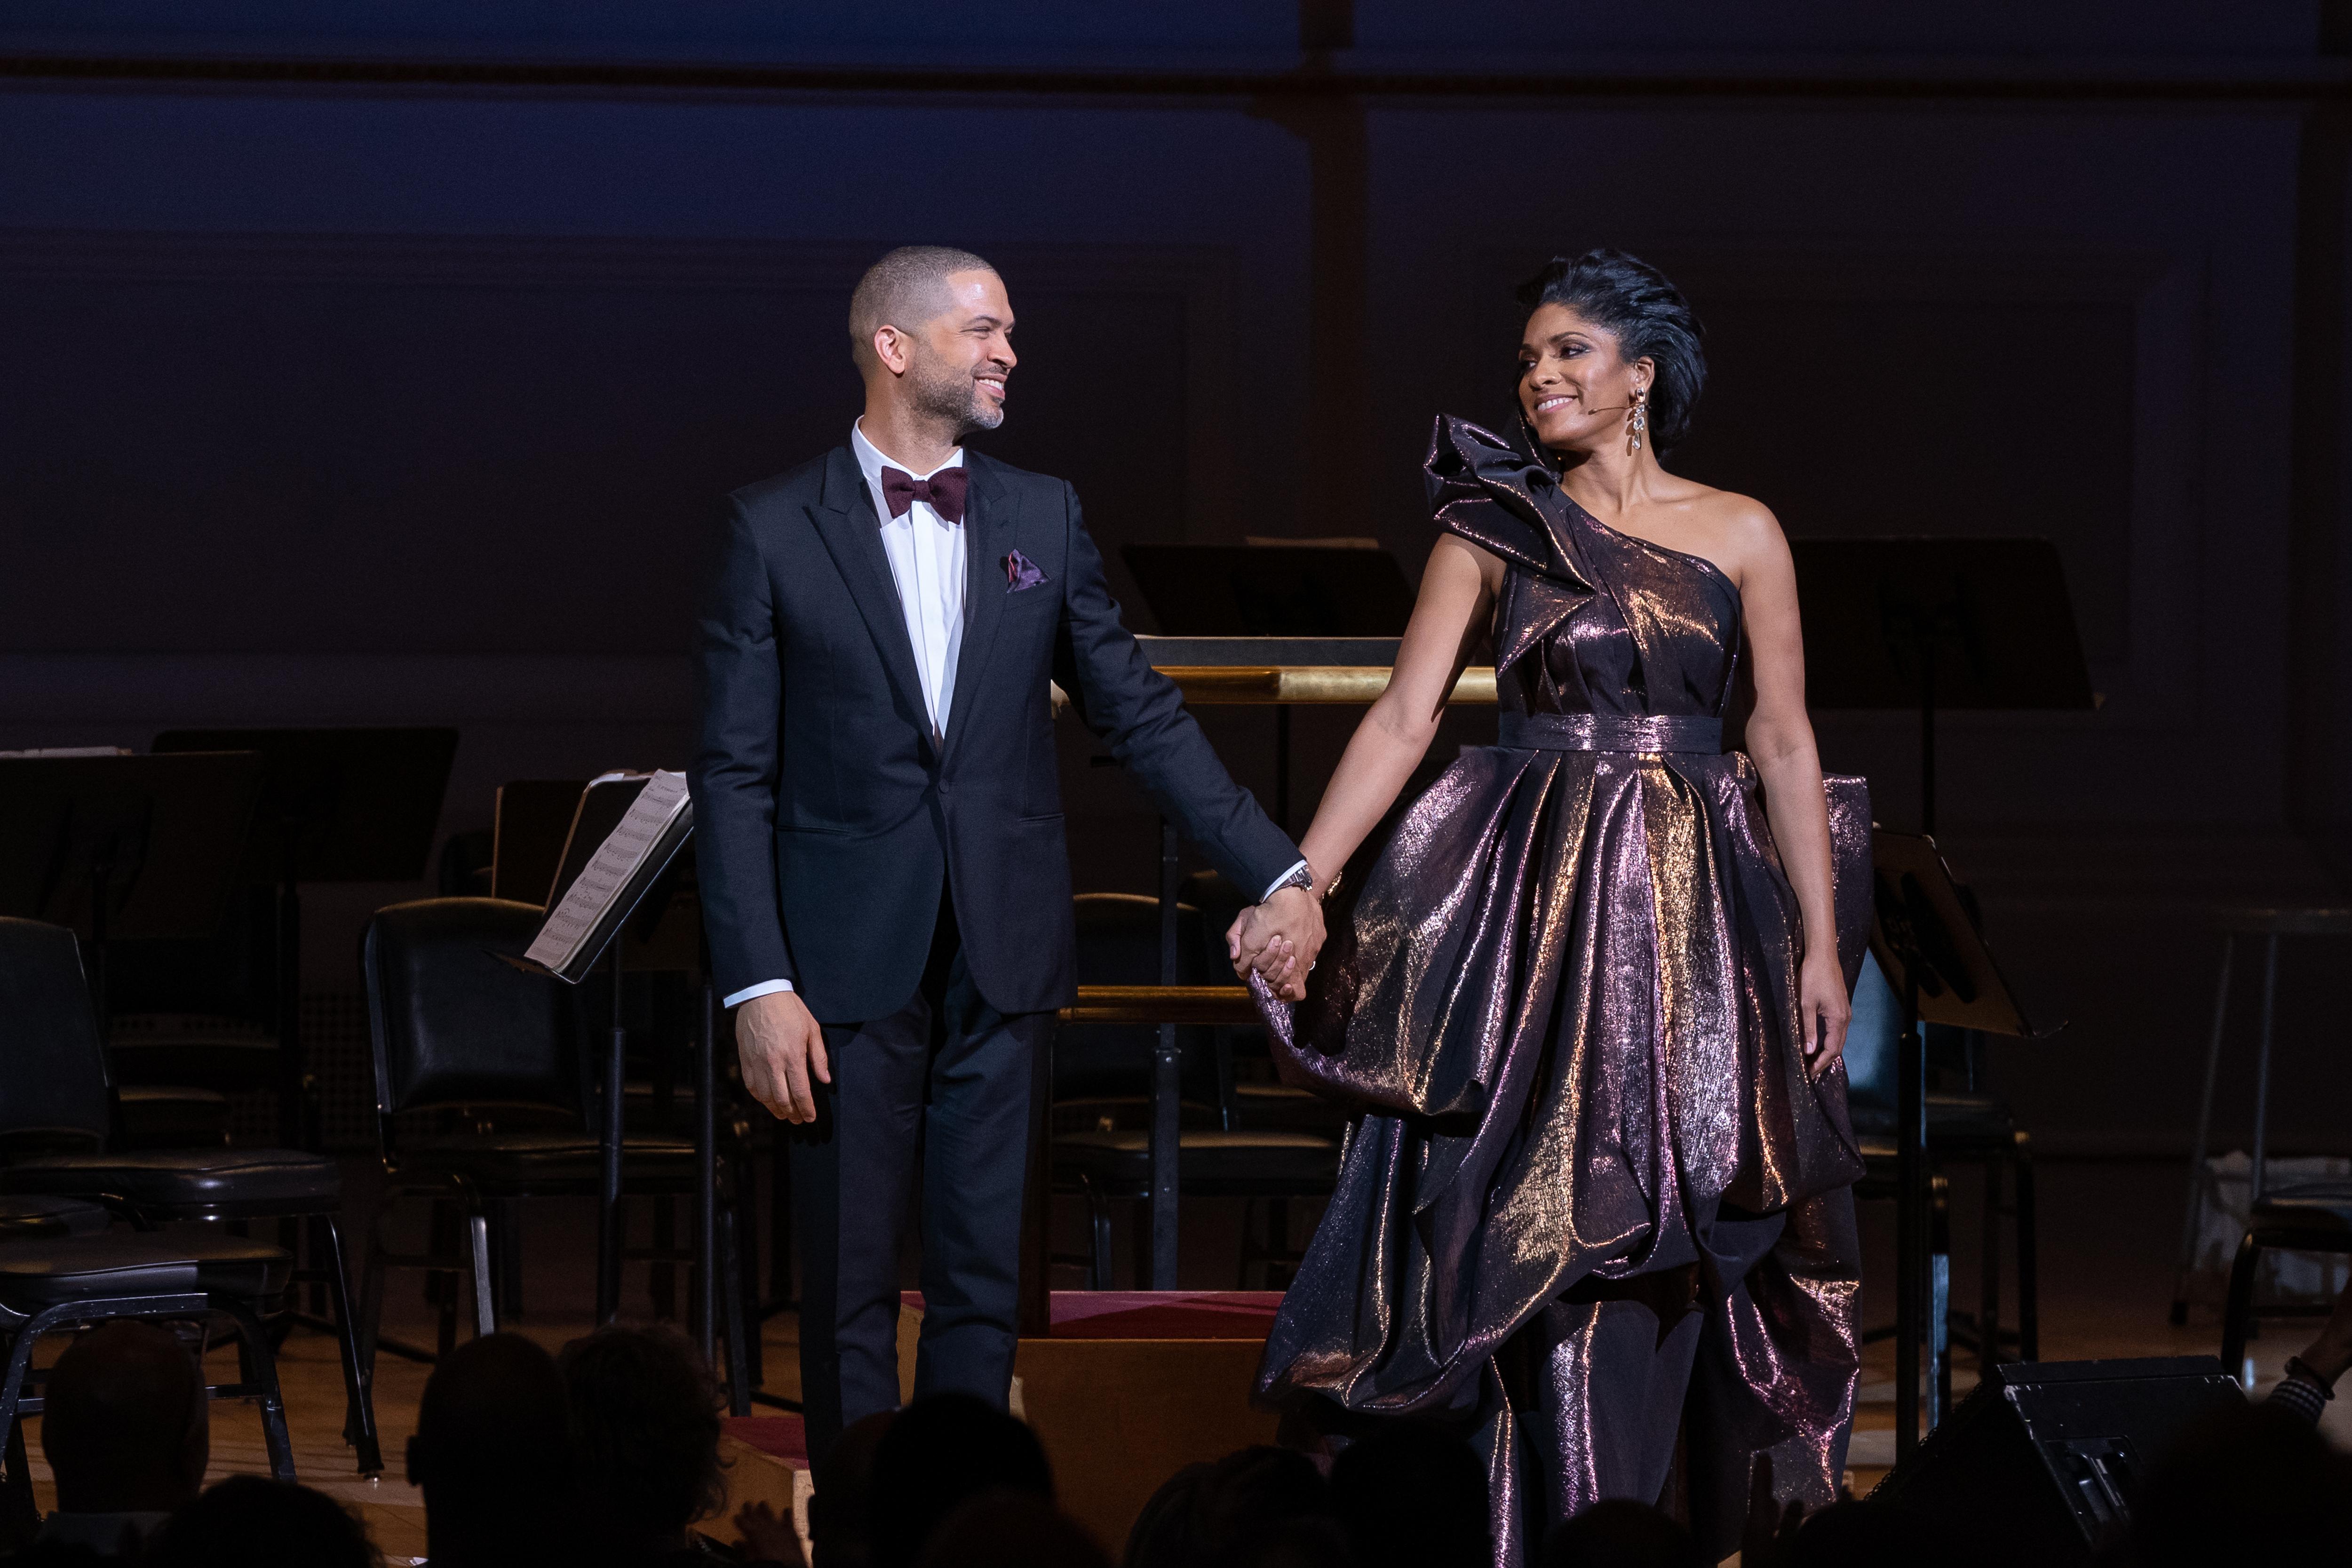 Live Review: Jason and Alicia Hall Moran in Washington - JazzTimes